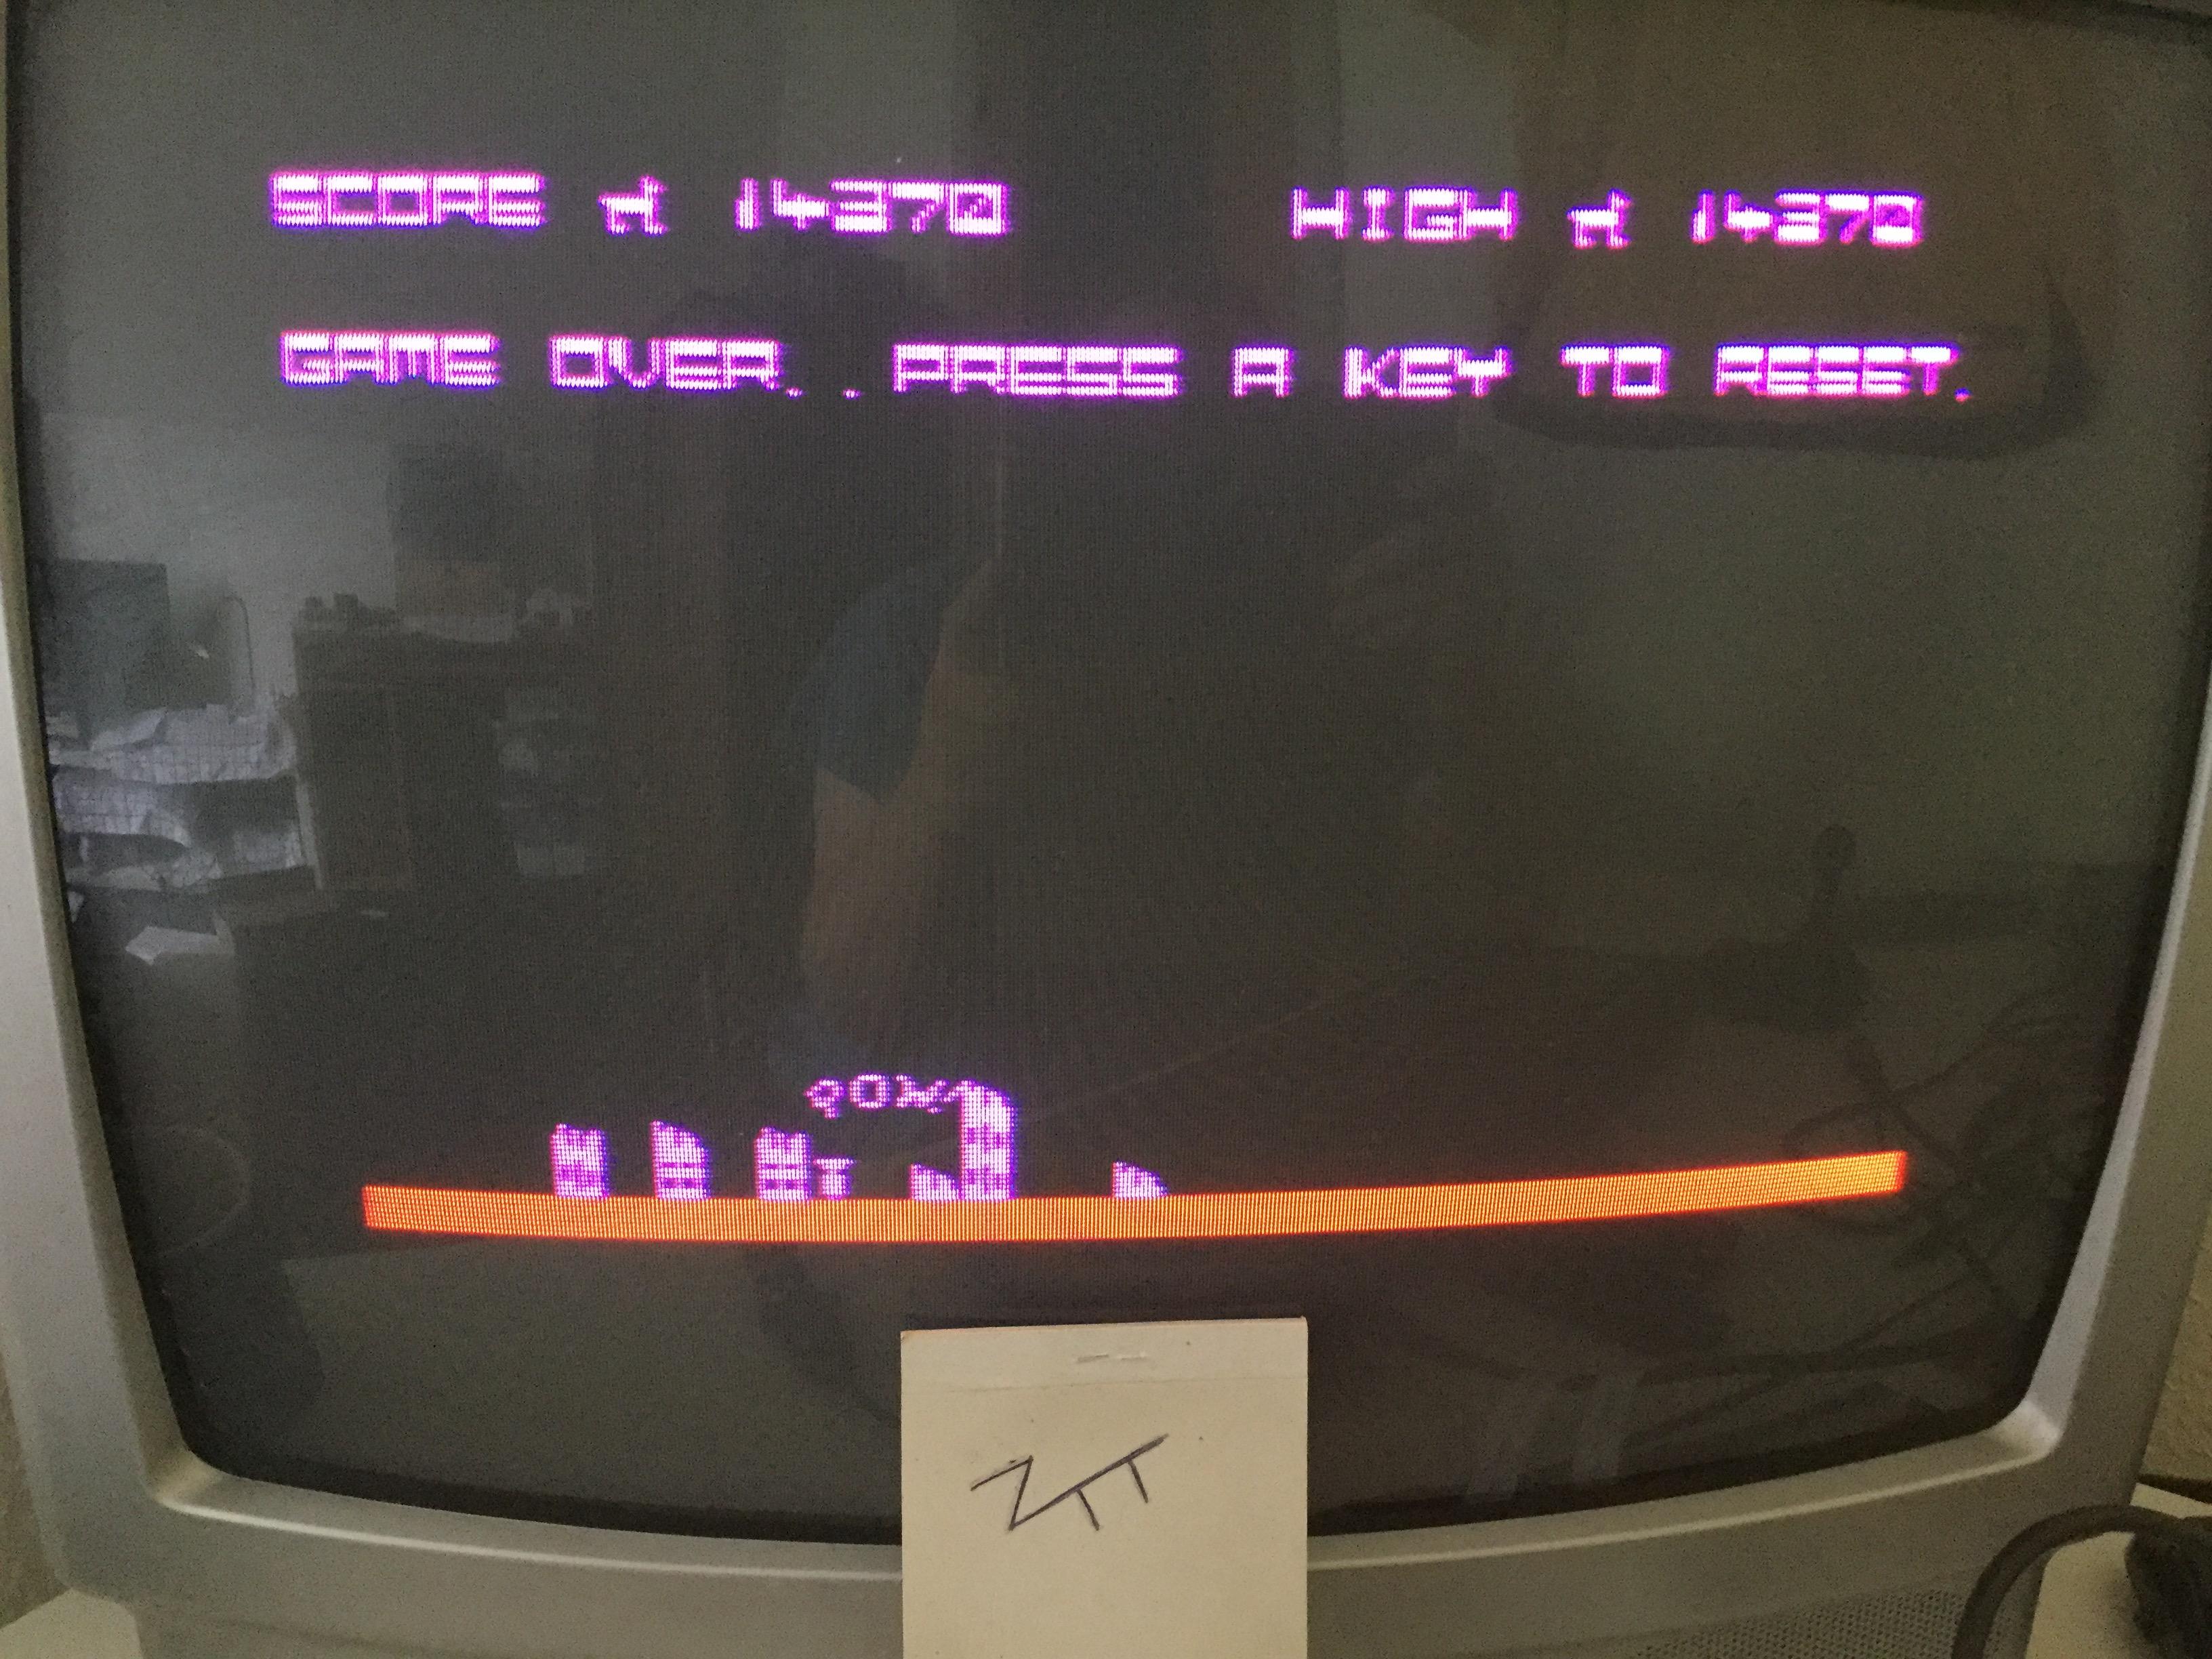 Frankie: Bomber / City Bomber [Llamasoft] [Skill Level: 1 - Wave: 1] (ZX Spectrum) 14,370 points on 2018-09-09 06:42:59